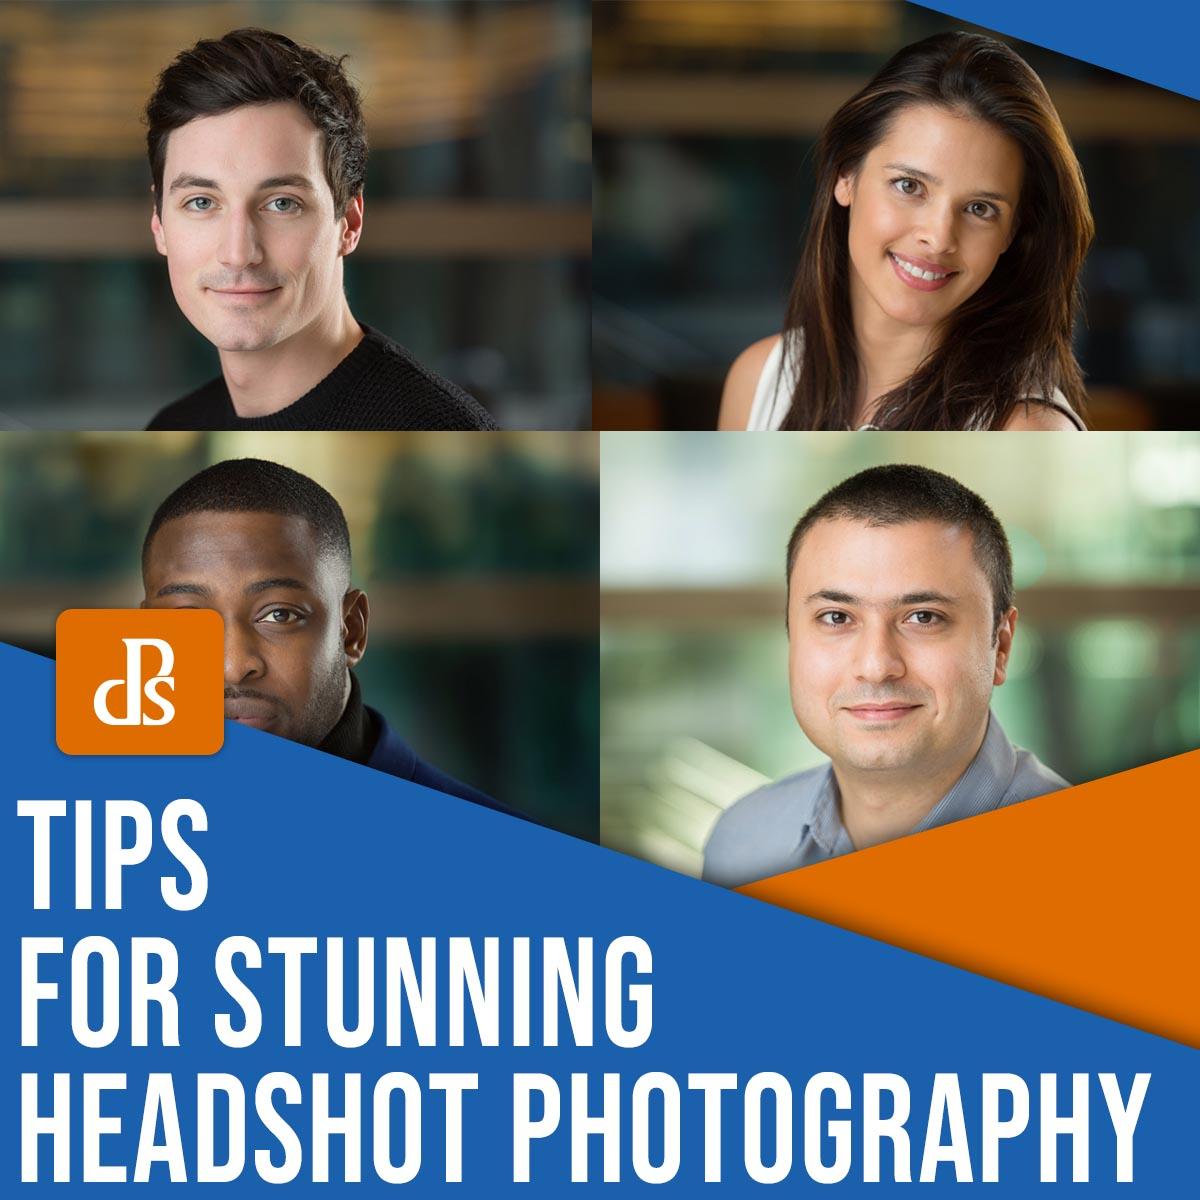 tips for stunning headshot photography